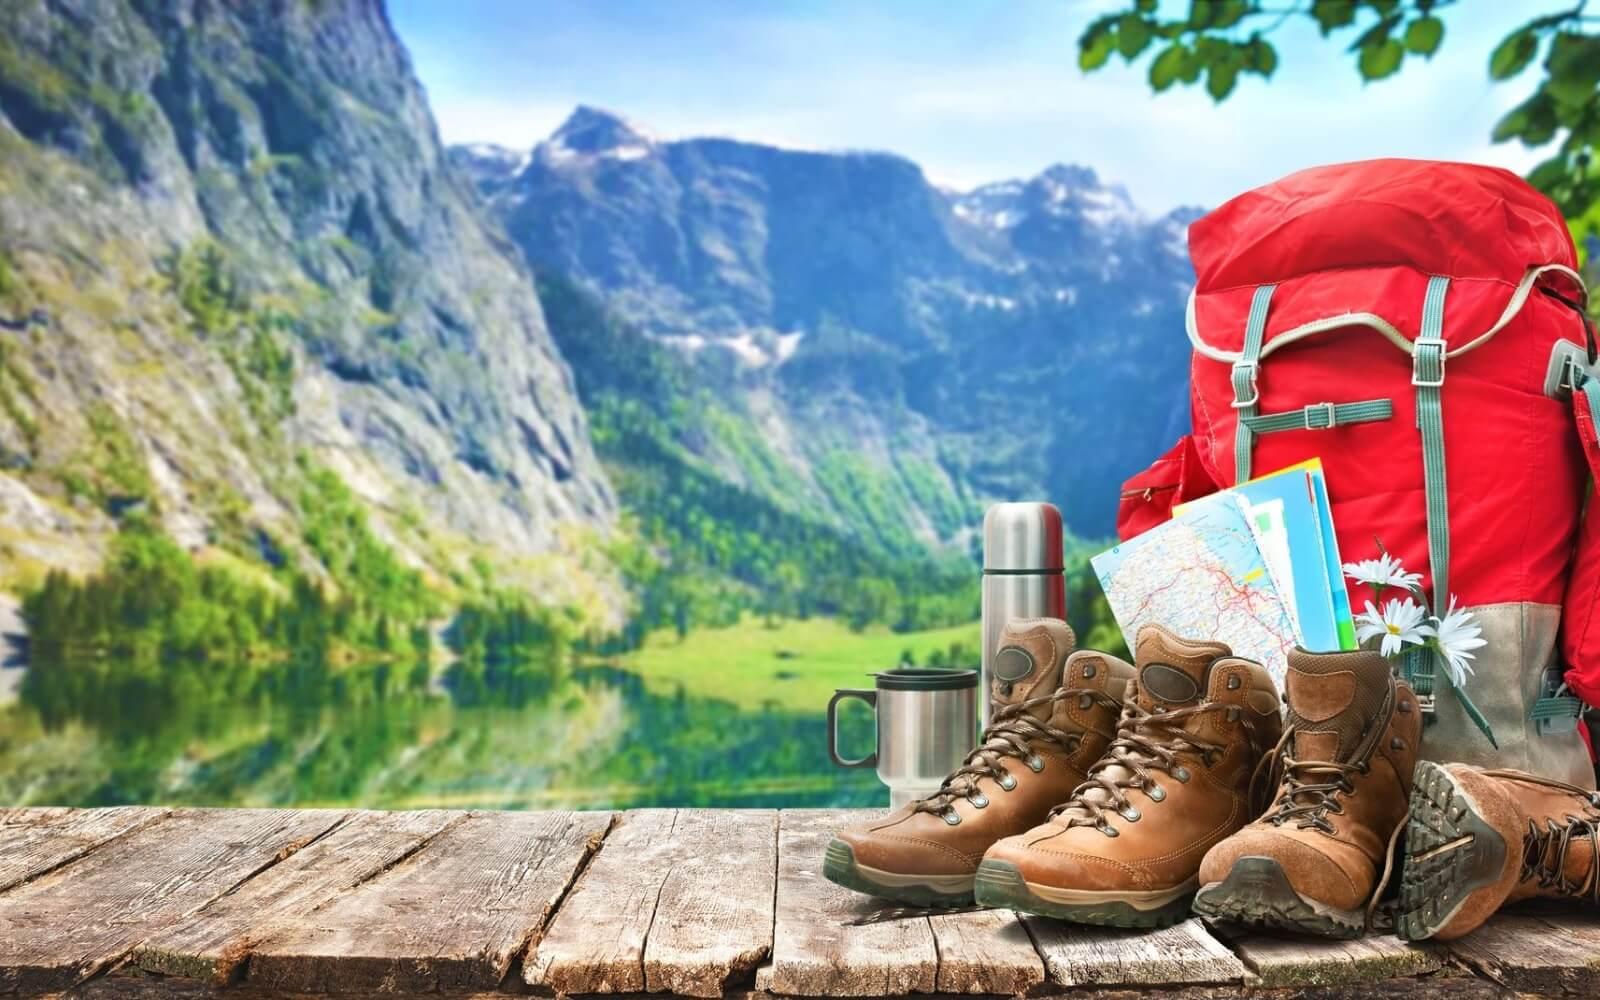 Cek Tips Hiking Aman untuk Penderita Diabetes